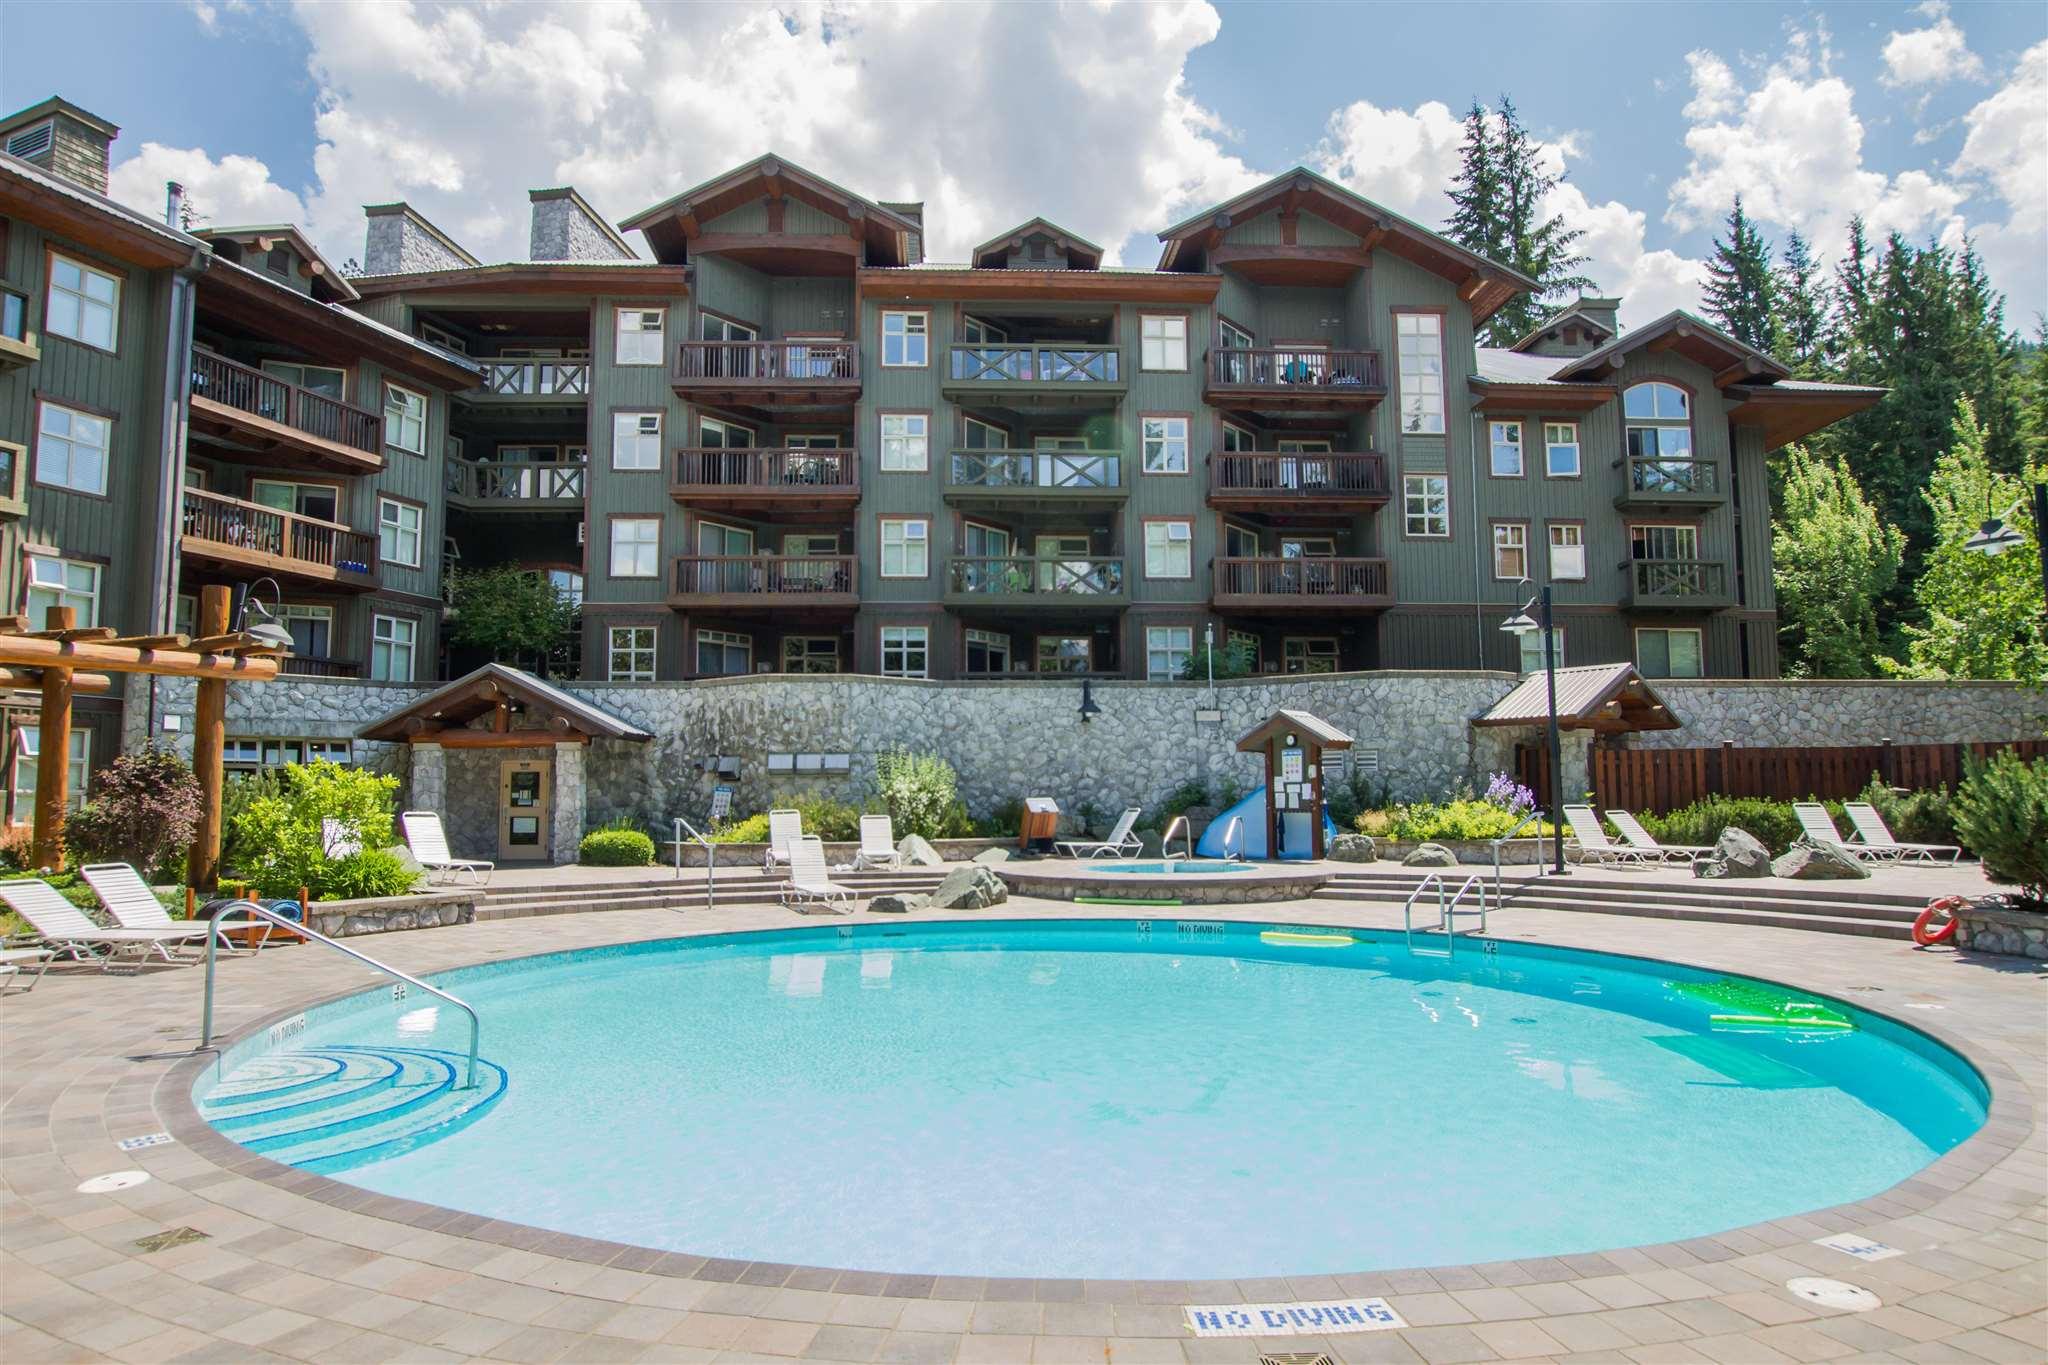 515 4660 BLACKCOMB WAY - Benchlands Apartment/Condo for sale(R2599759)